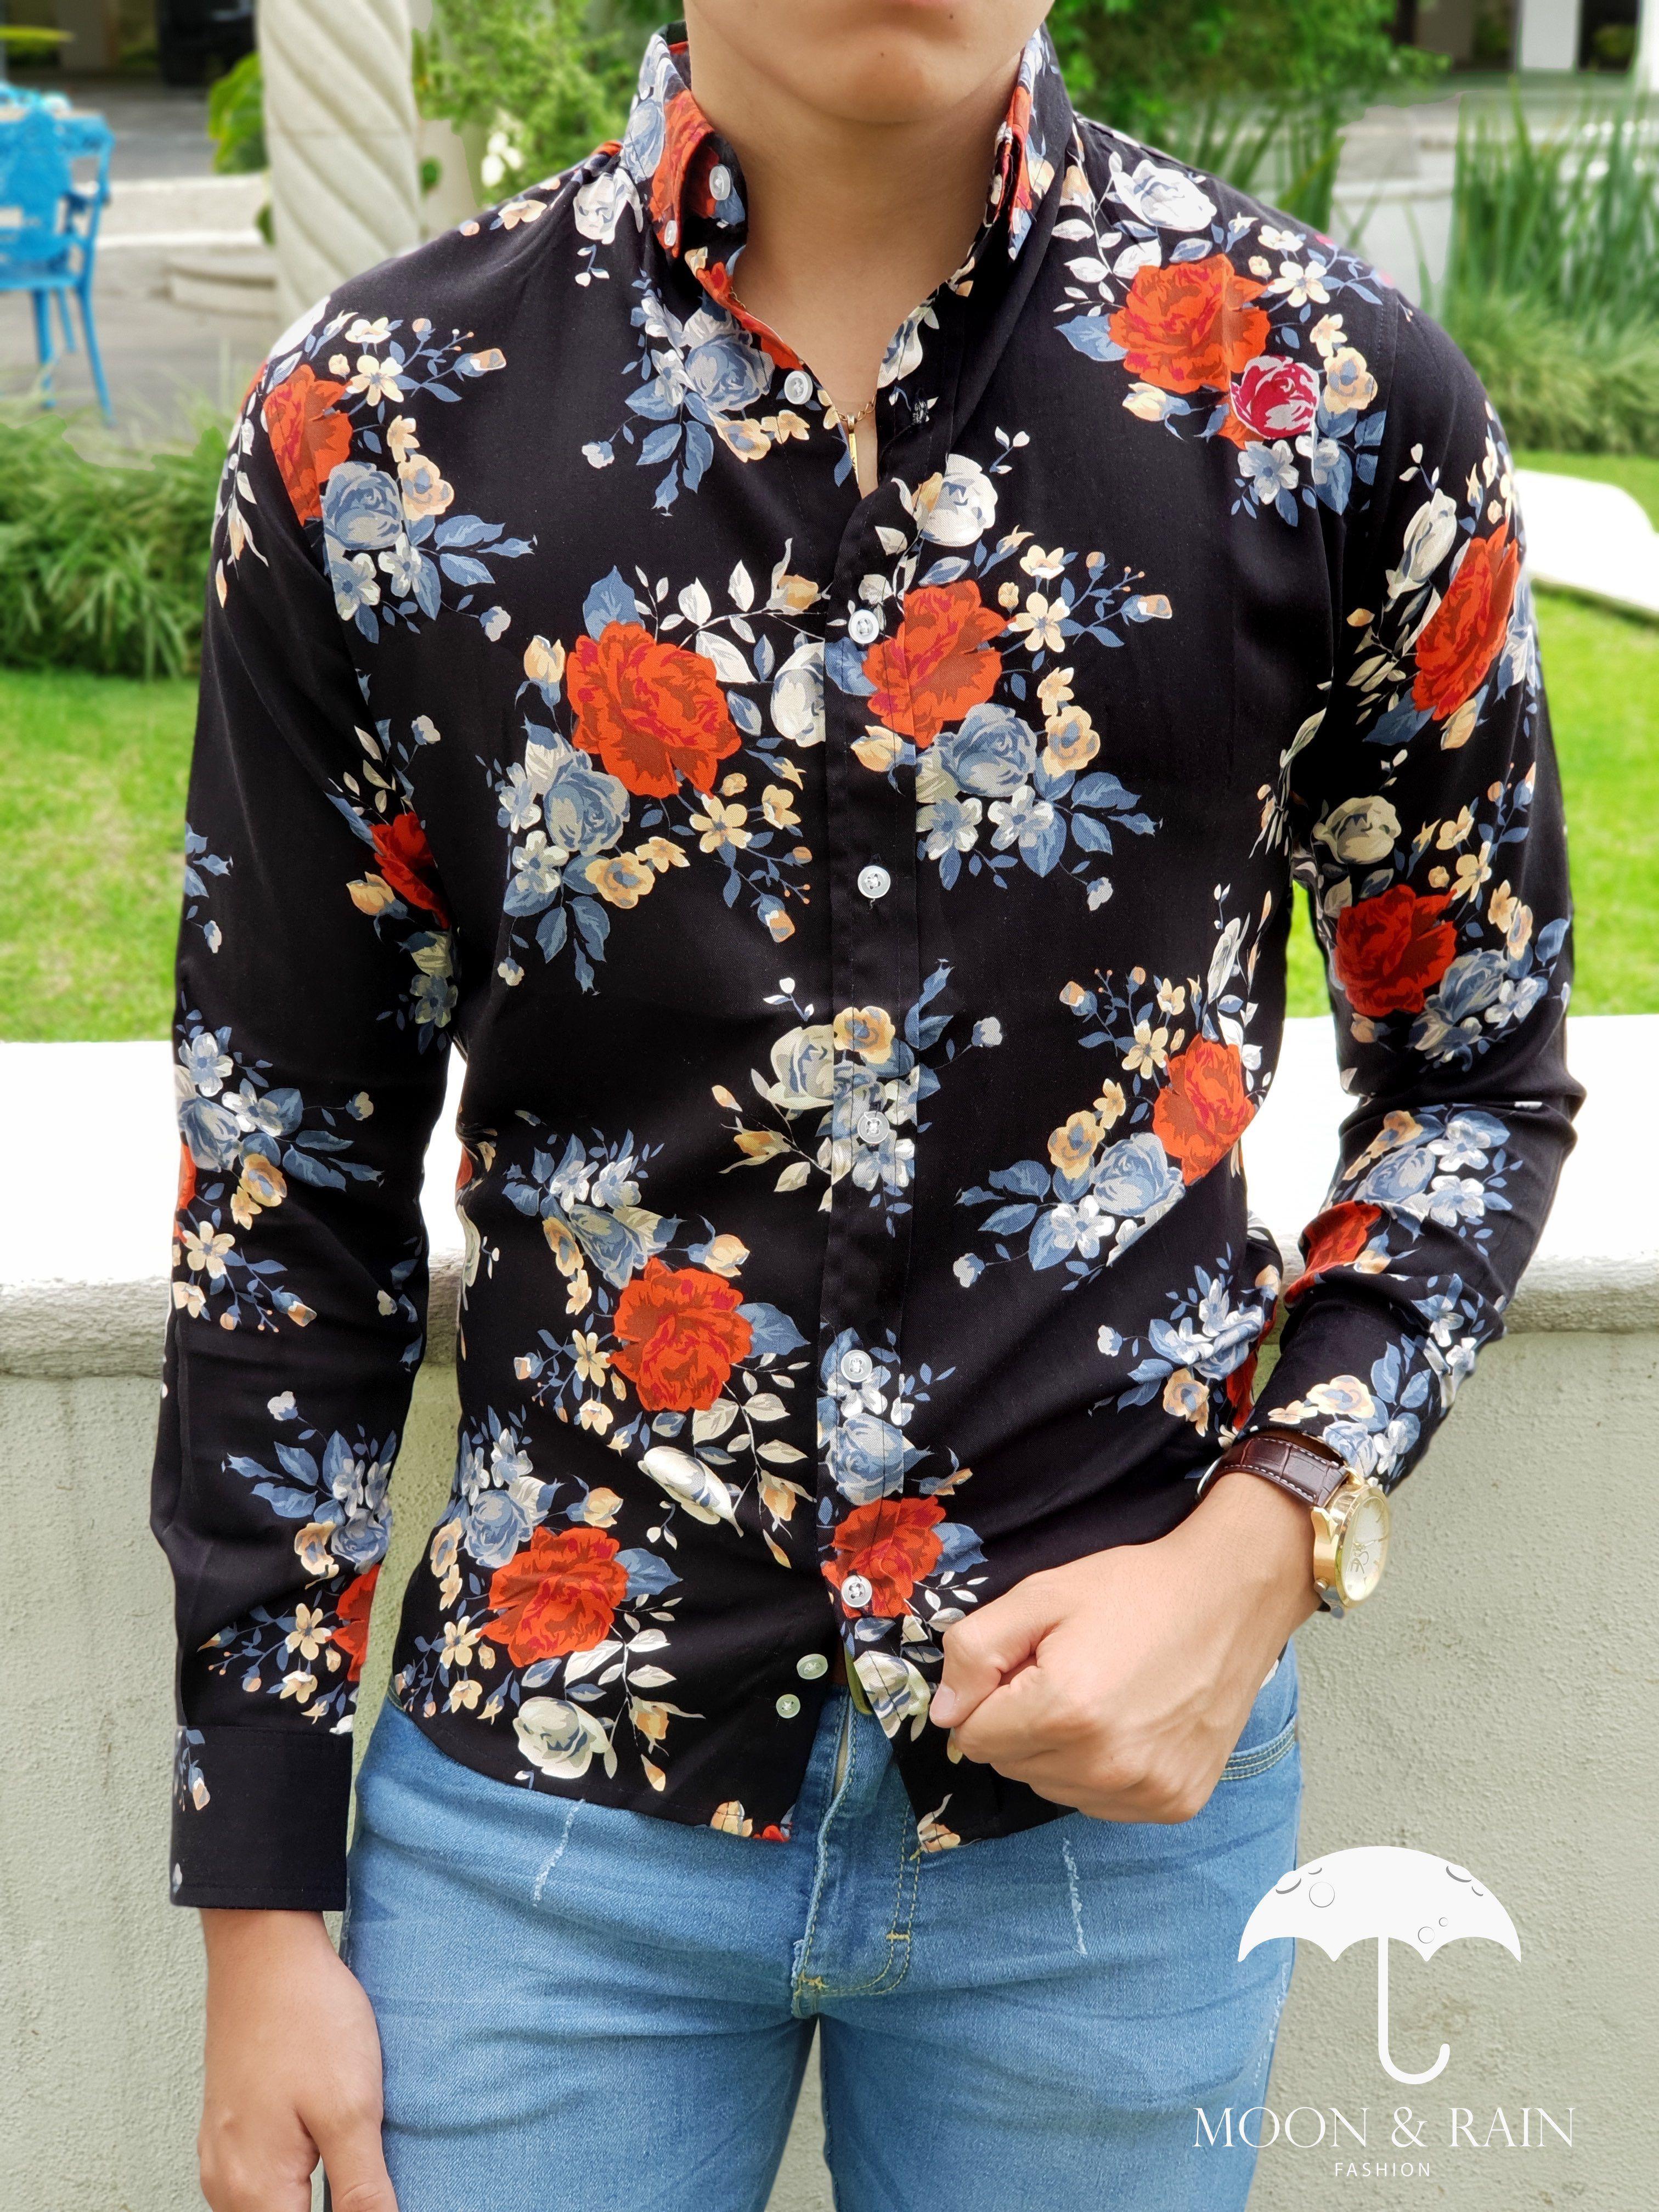 2ed7b7b565b22 Outfit para hombre  camisa negra con flores rojas y blancas en manga larga